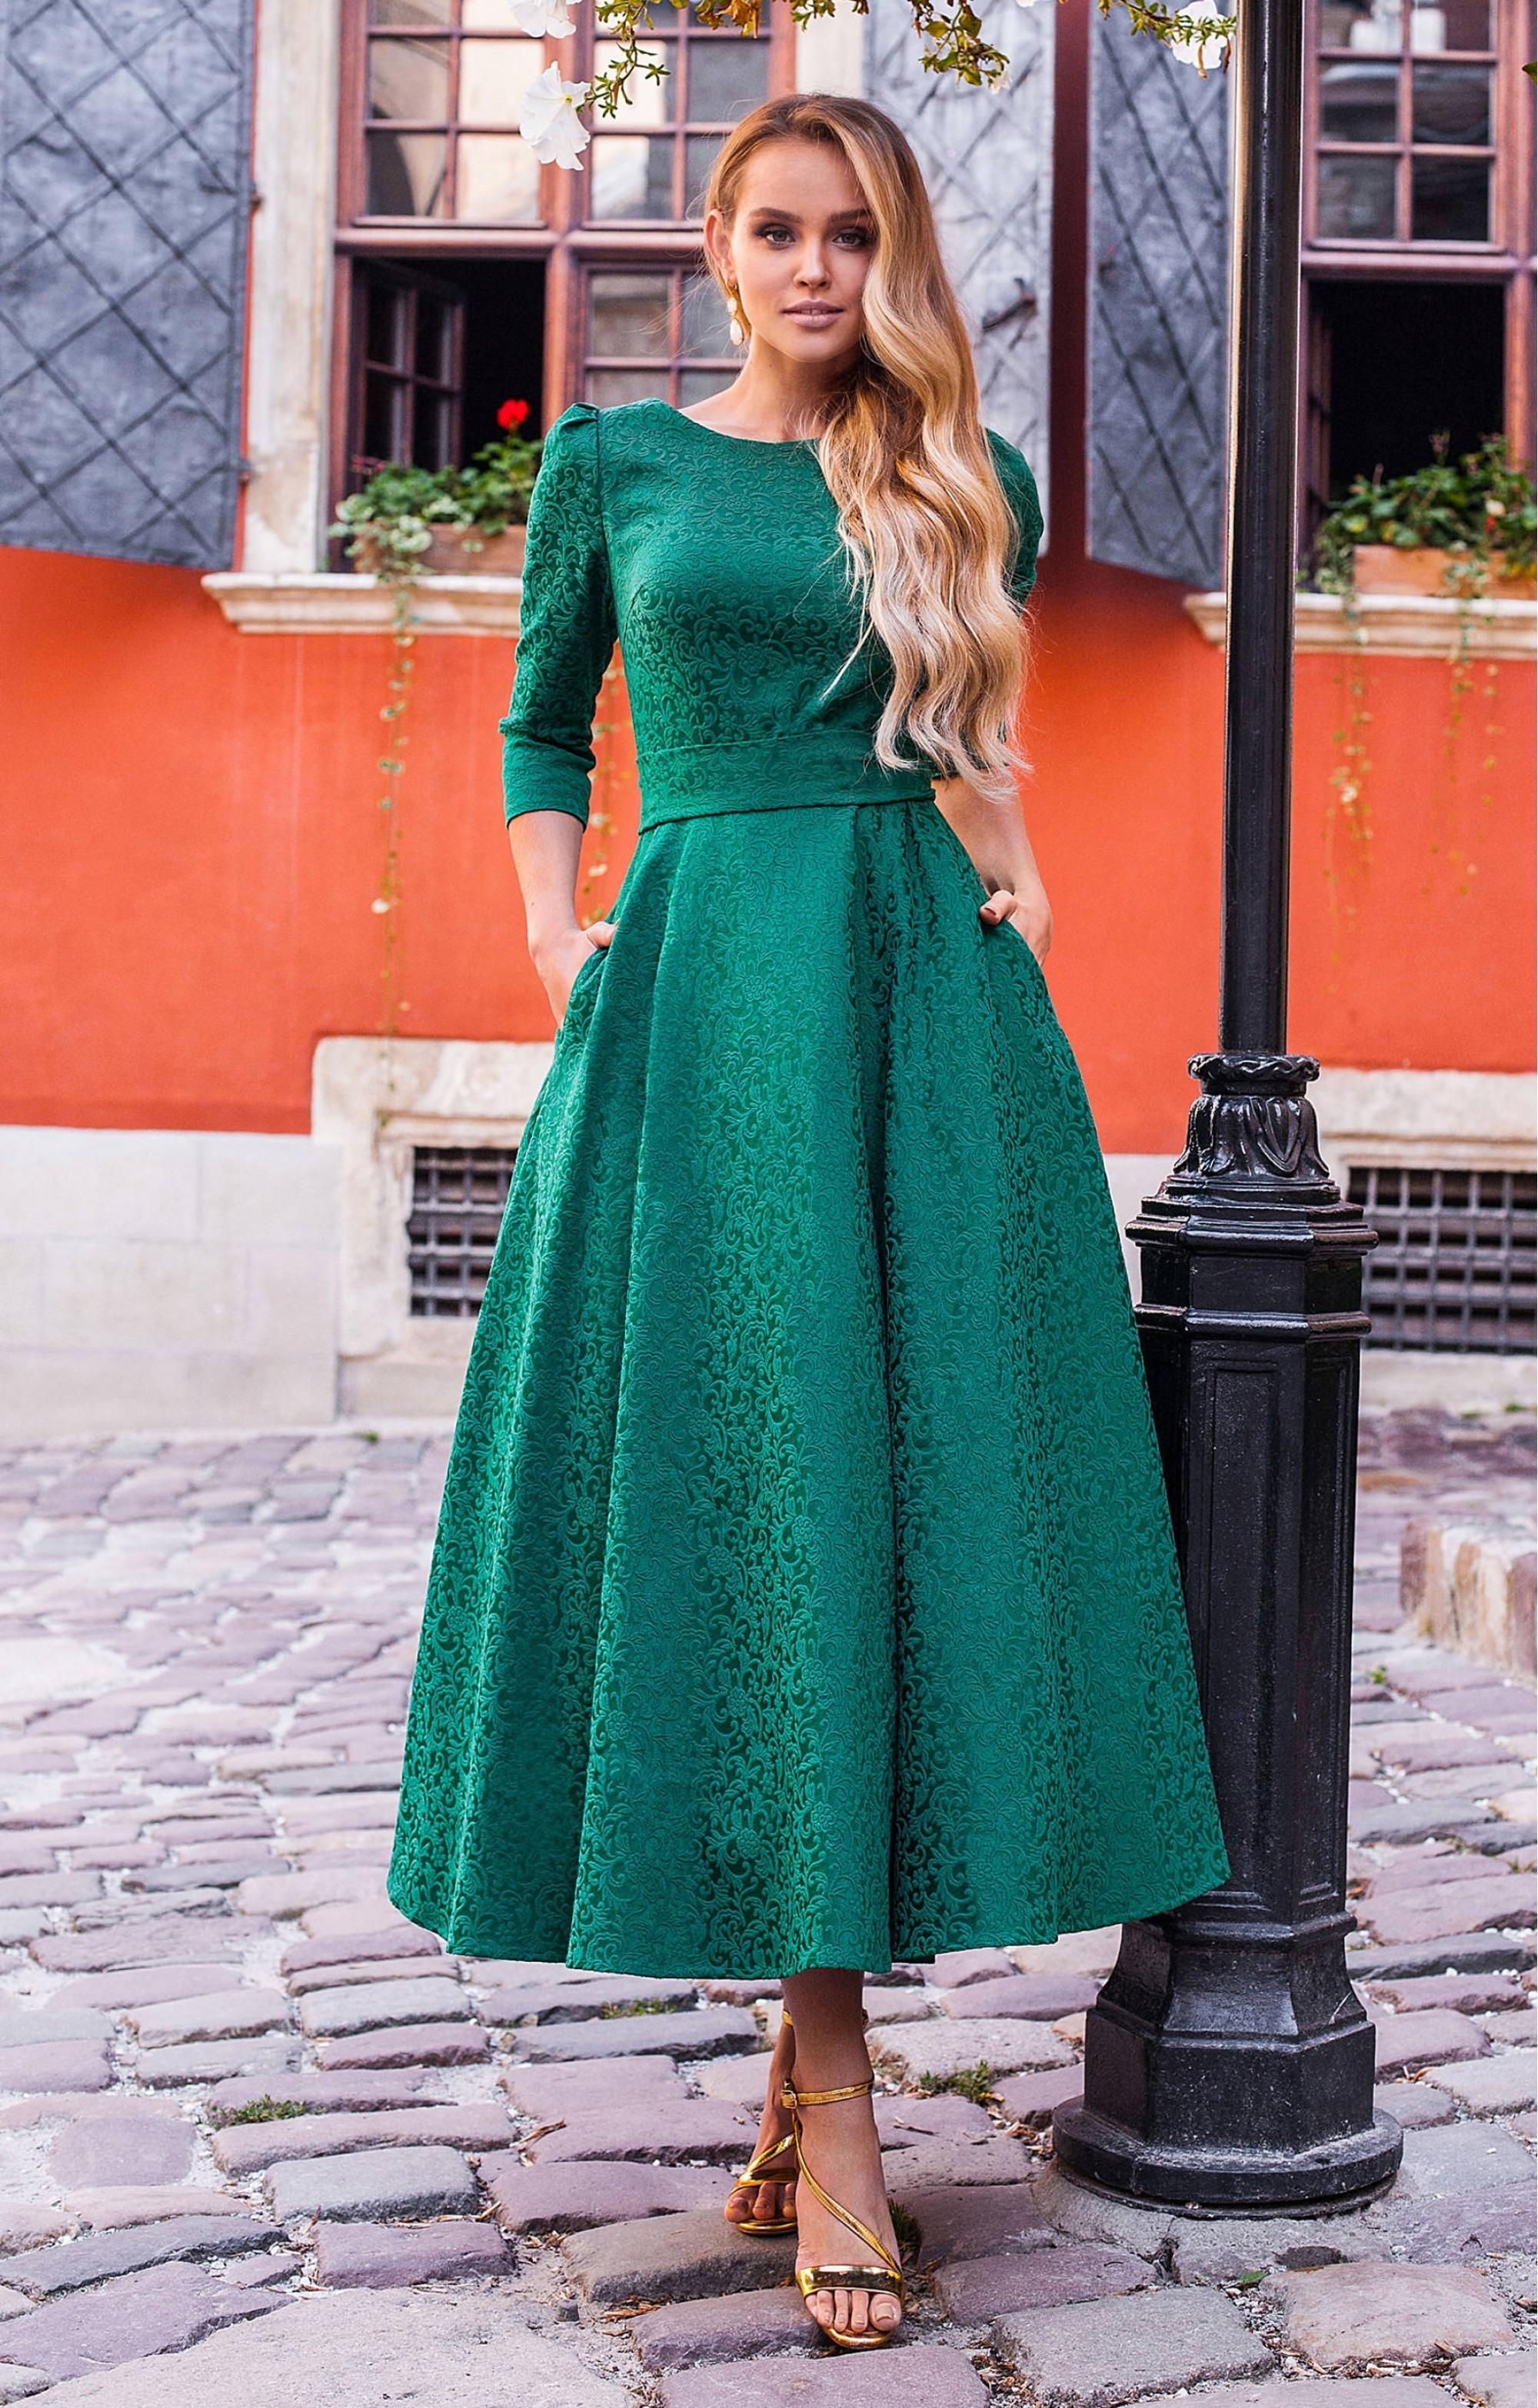 Abend Cool Abendkleider Eng Lang BoutiqueDesigner Ausgezeichnet Abendkleider Eng Lang Stylish